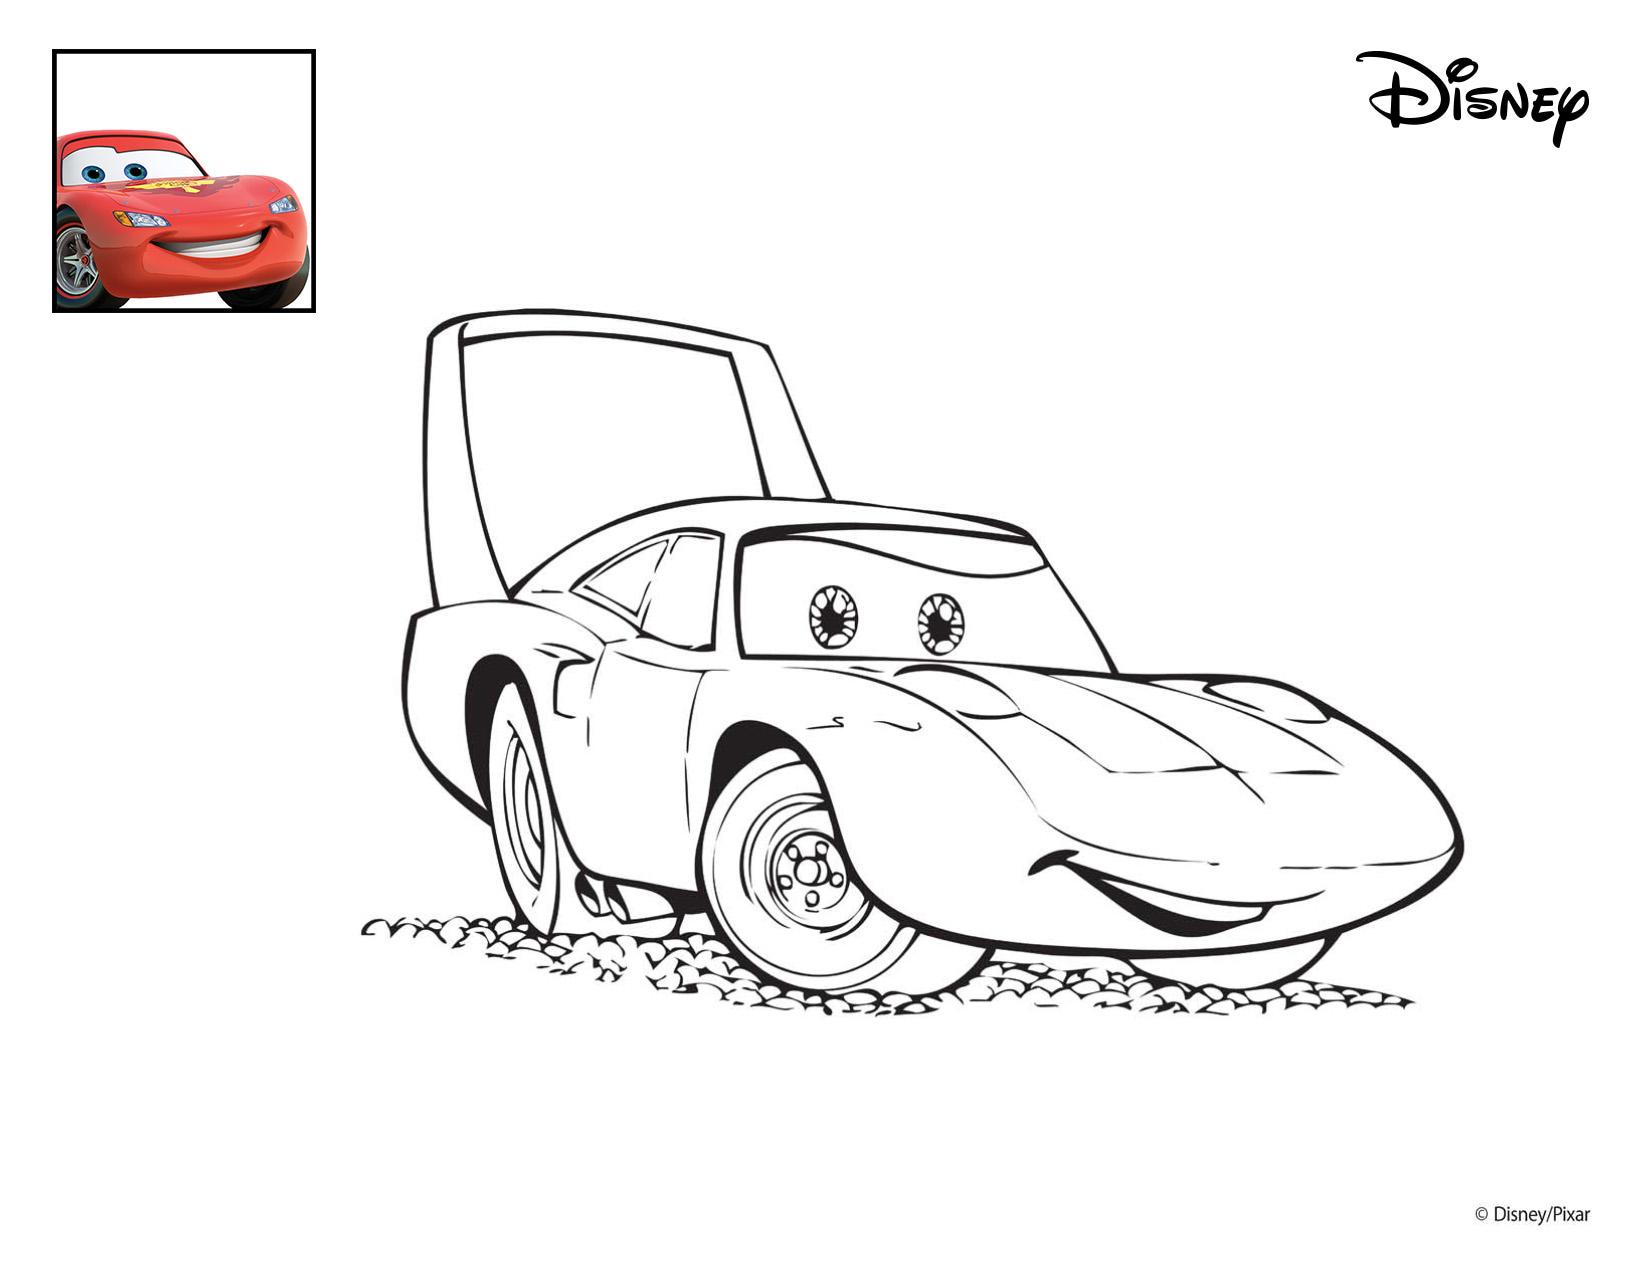 MyToys_Malvorlagen_Disney_Cars_Der-King myToys-Blog